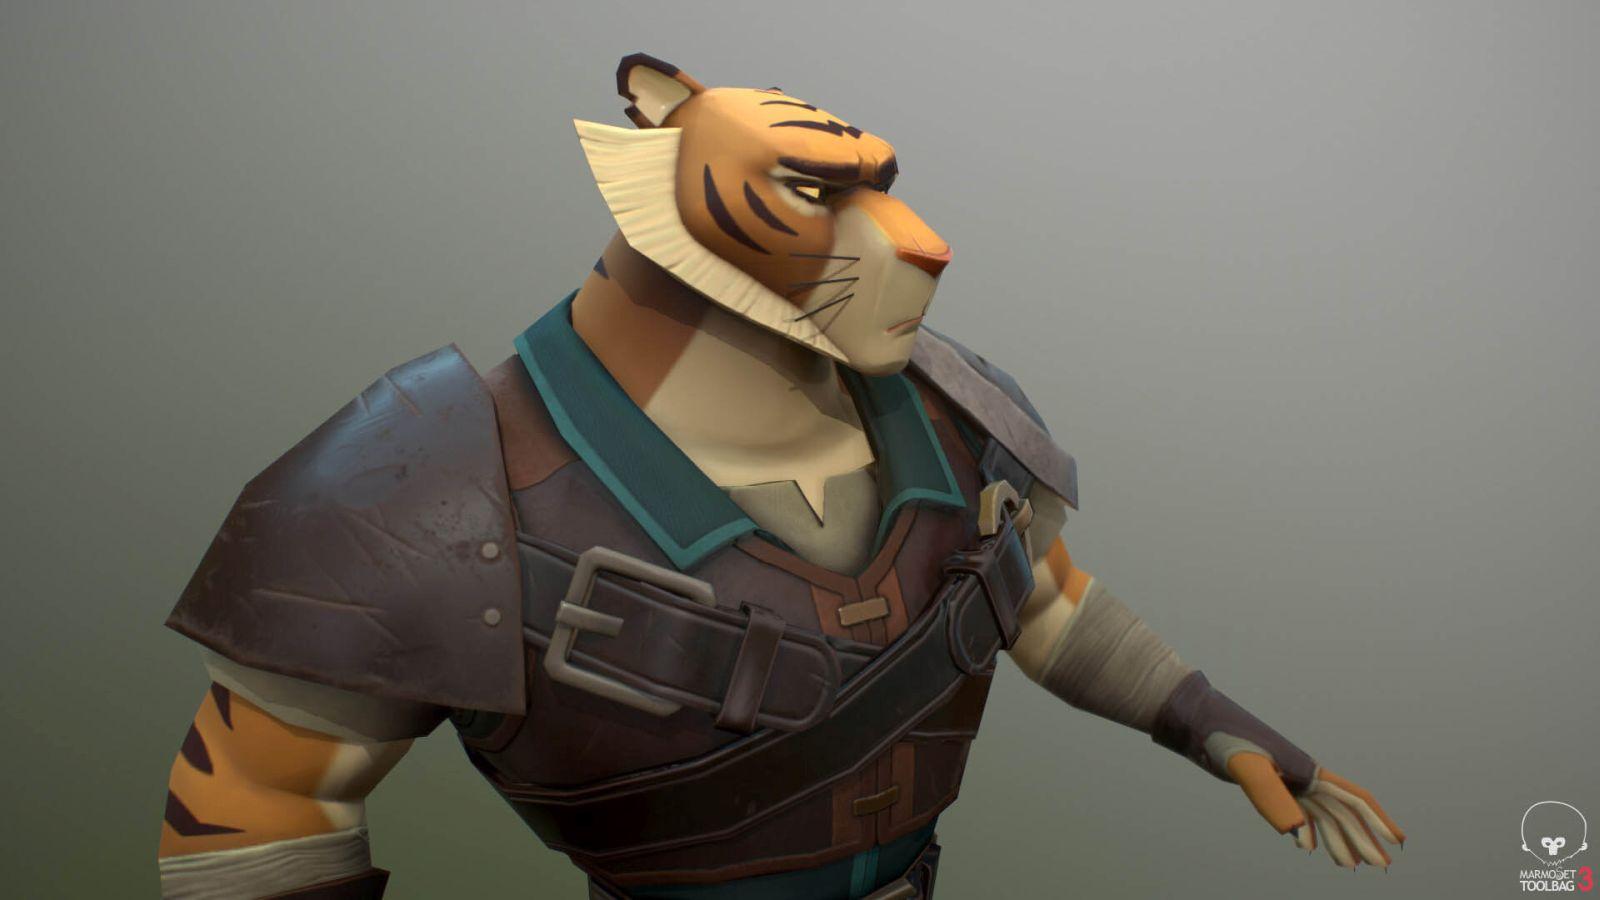 3d model tiger warrior by thiagobatista